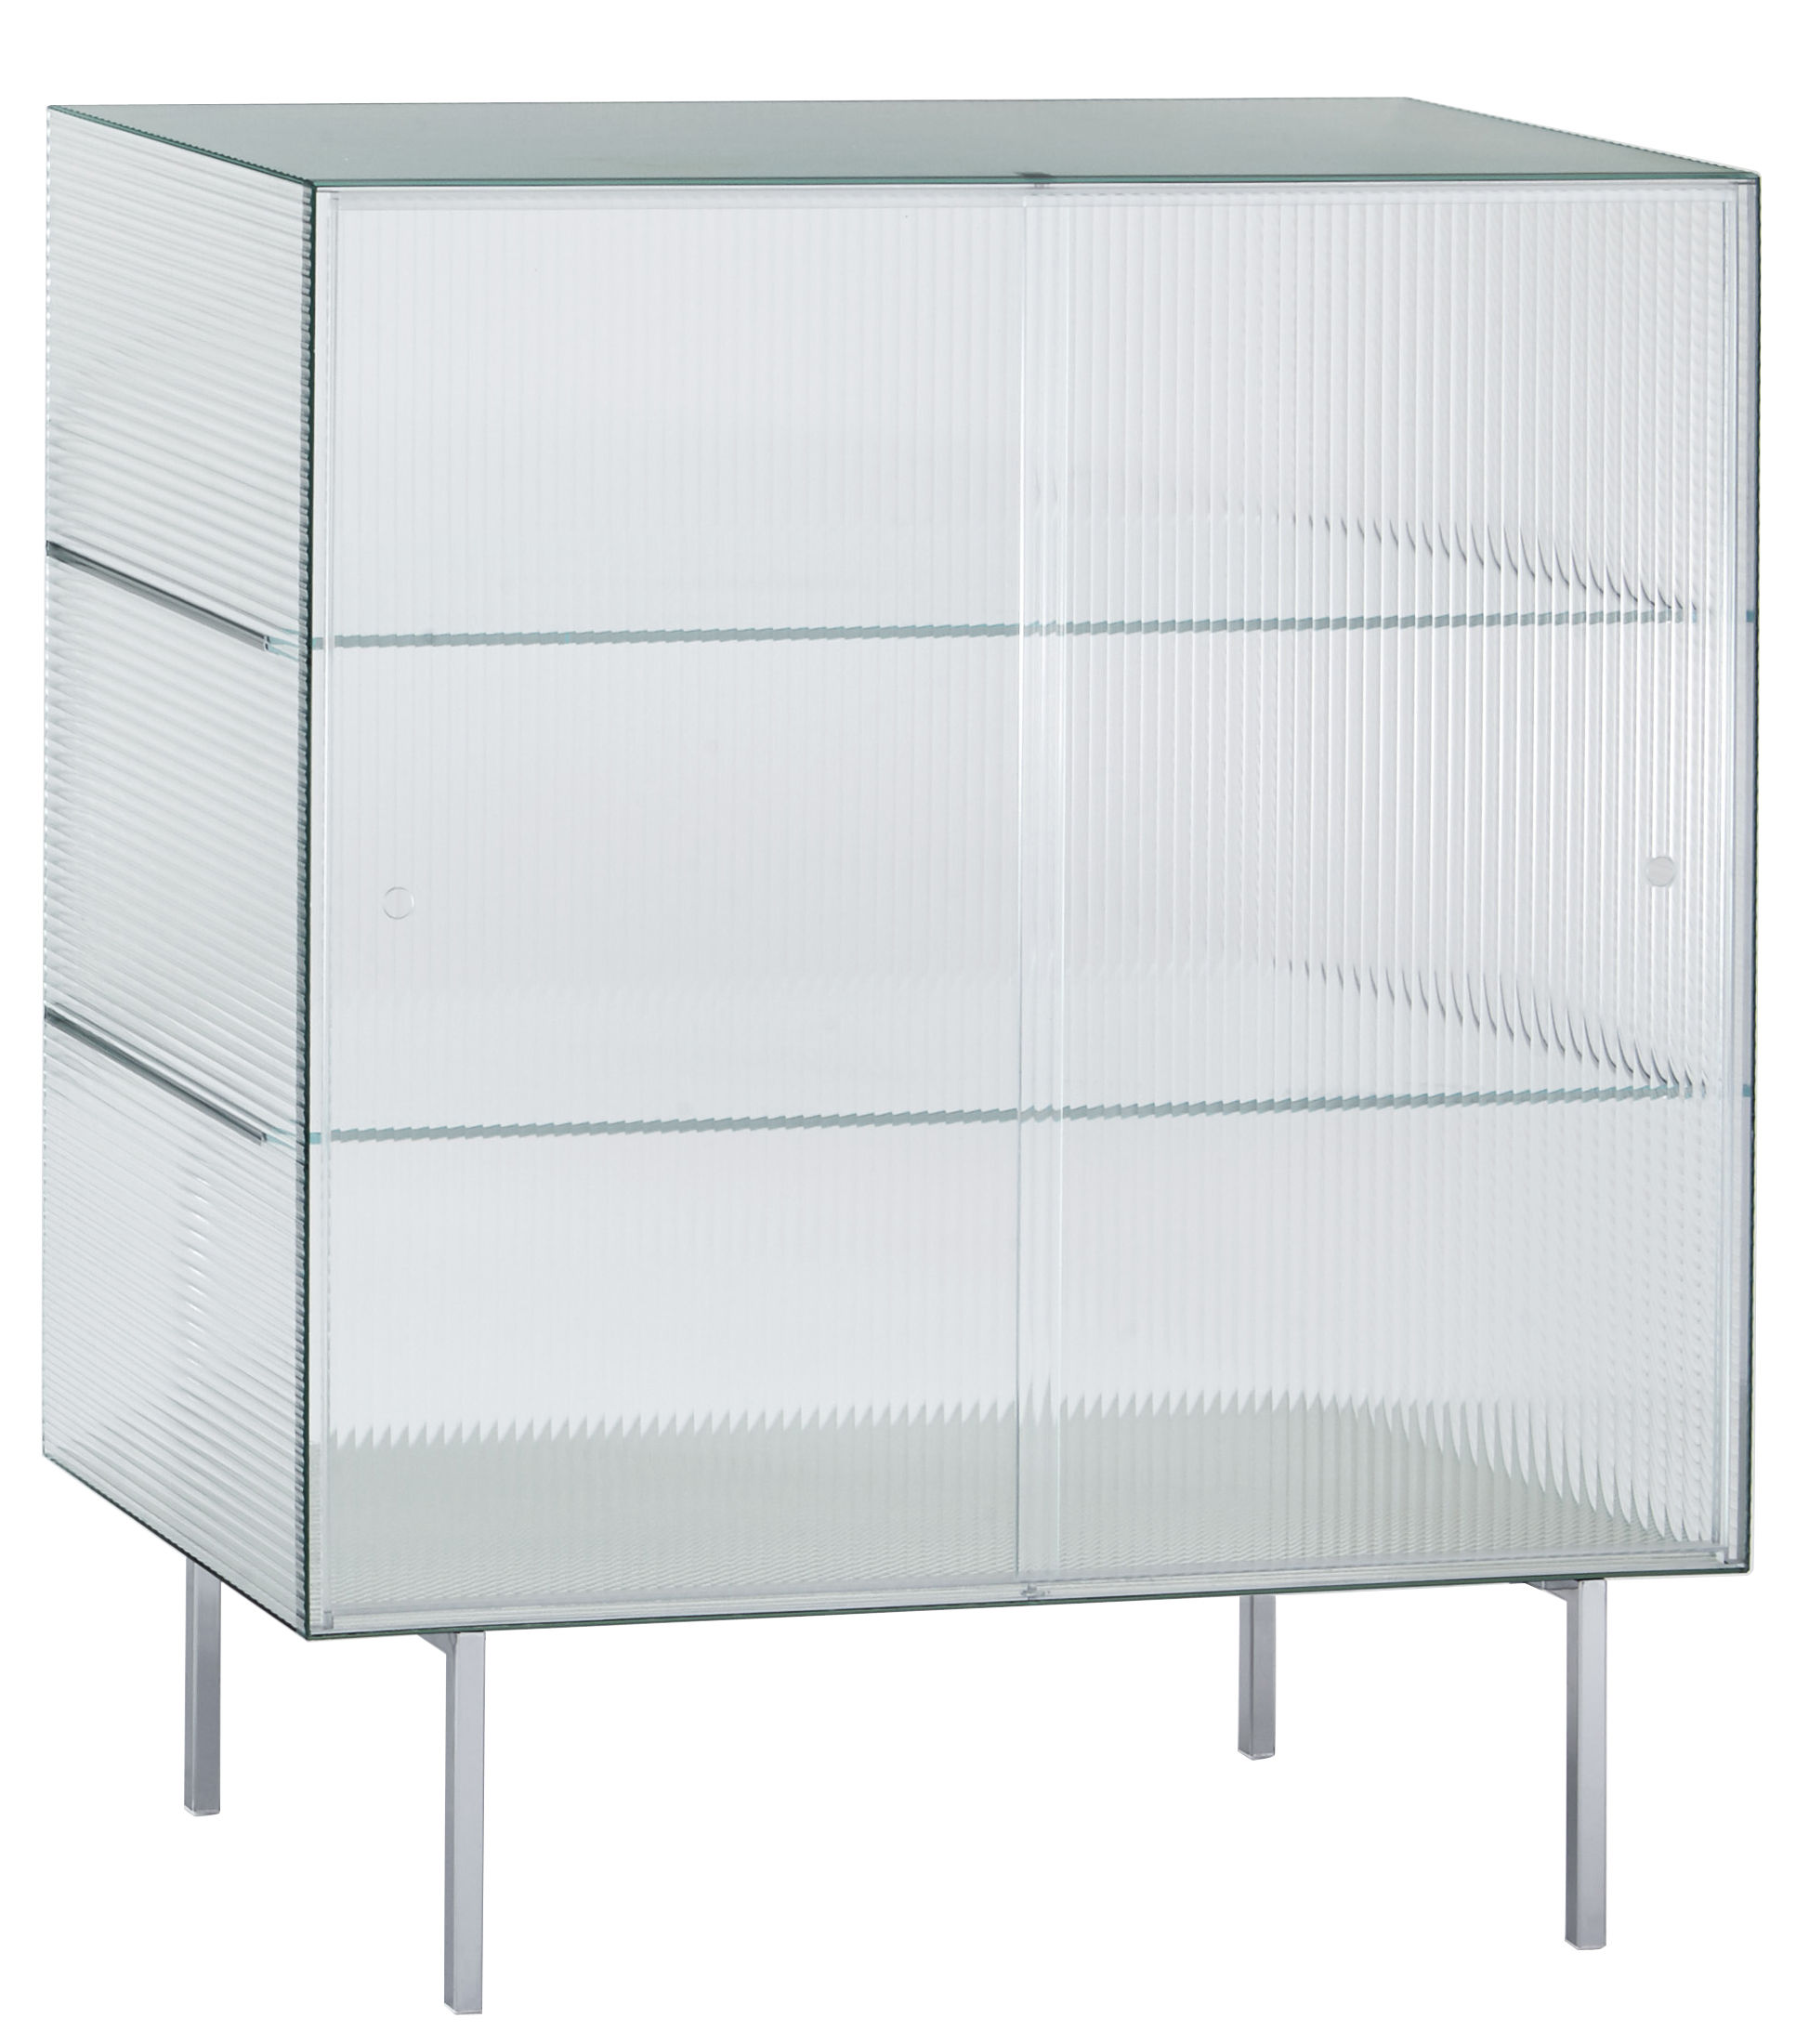 Furniture - Dressers & Storage Units - Commodore haut Dresser - Glass - 100 x 120 cm by Glas Italia - Transparent striped / Chromed legs - Chromed metal, Soak glass